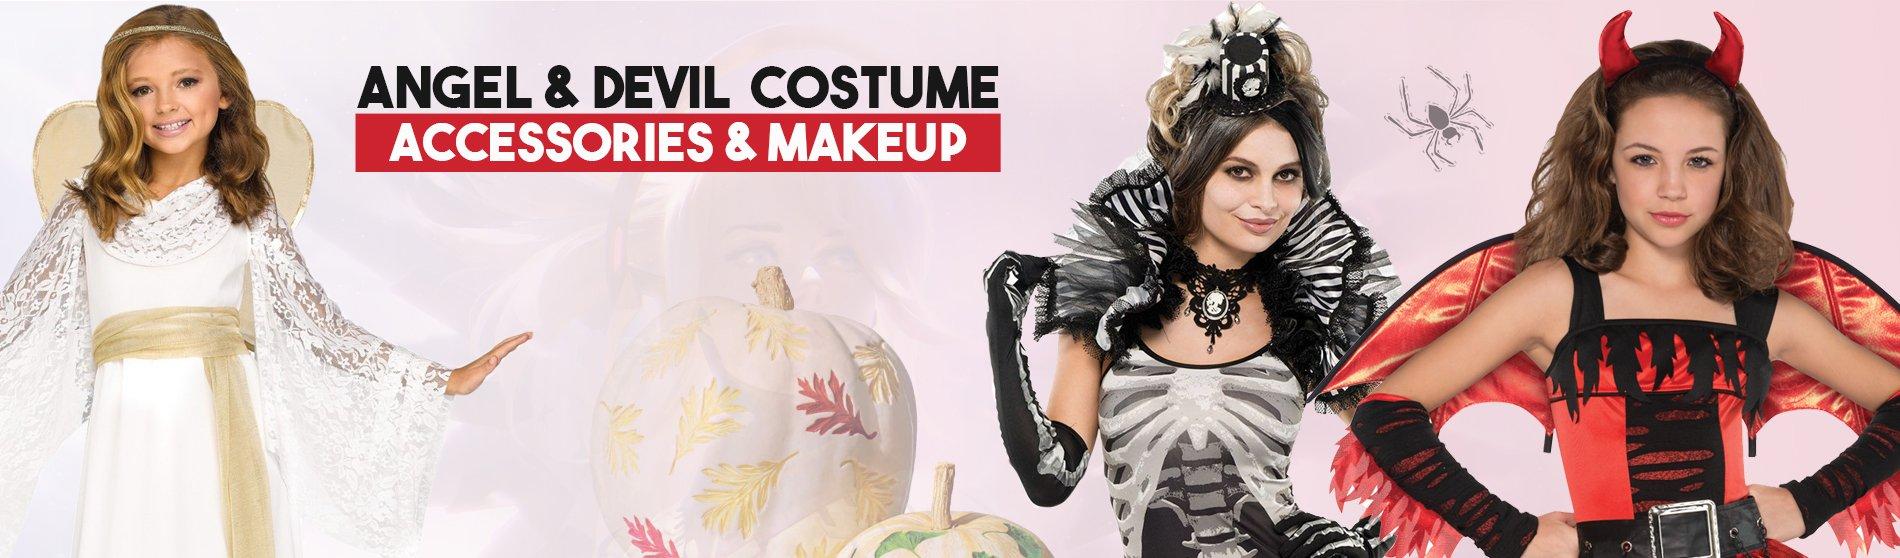 Angel-Devil-Costume-Accessorie-Makeup